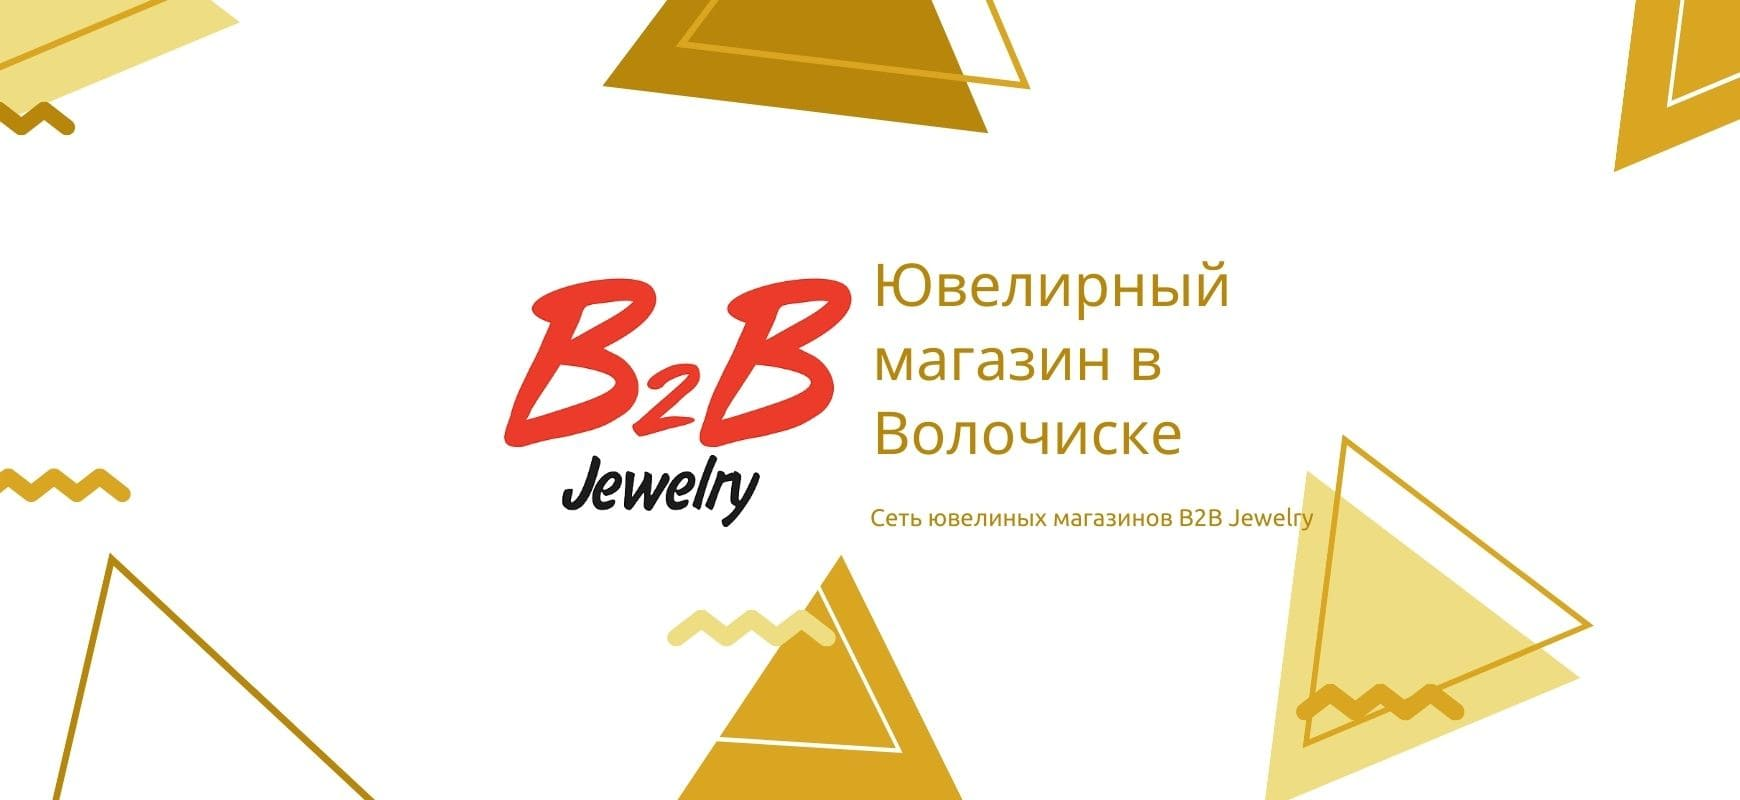 B2B JEWELRY ВОЛОЧИСК